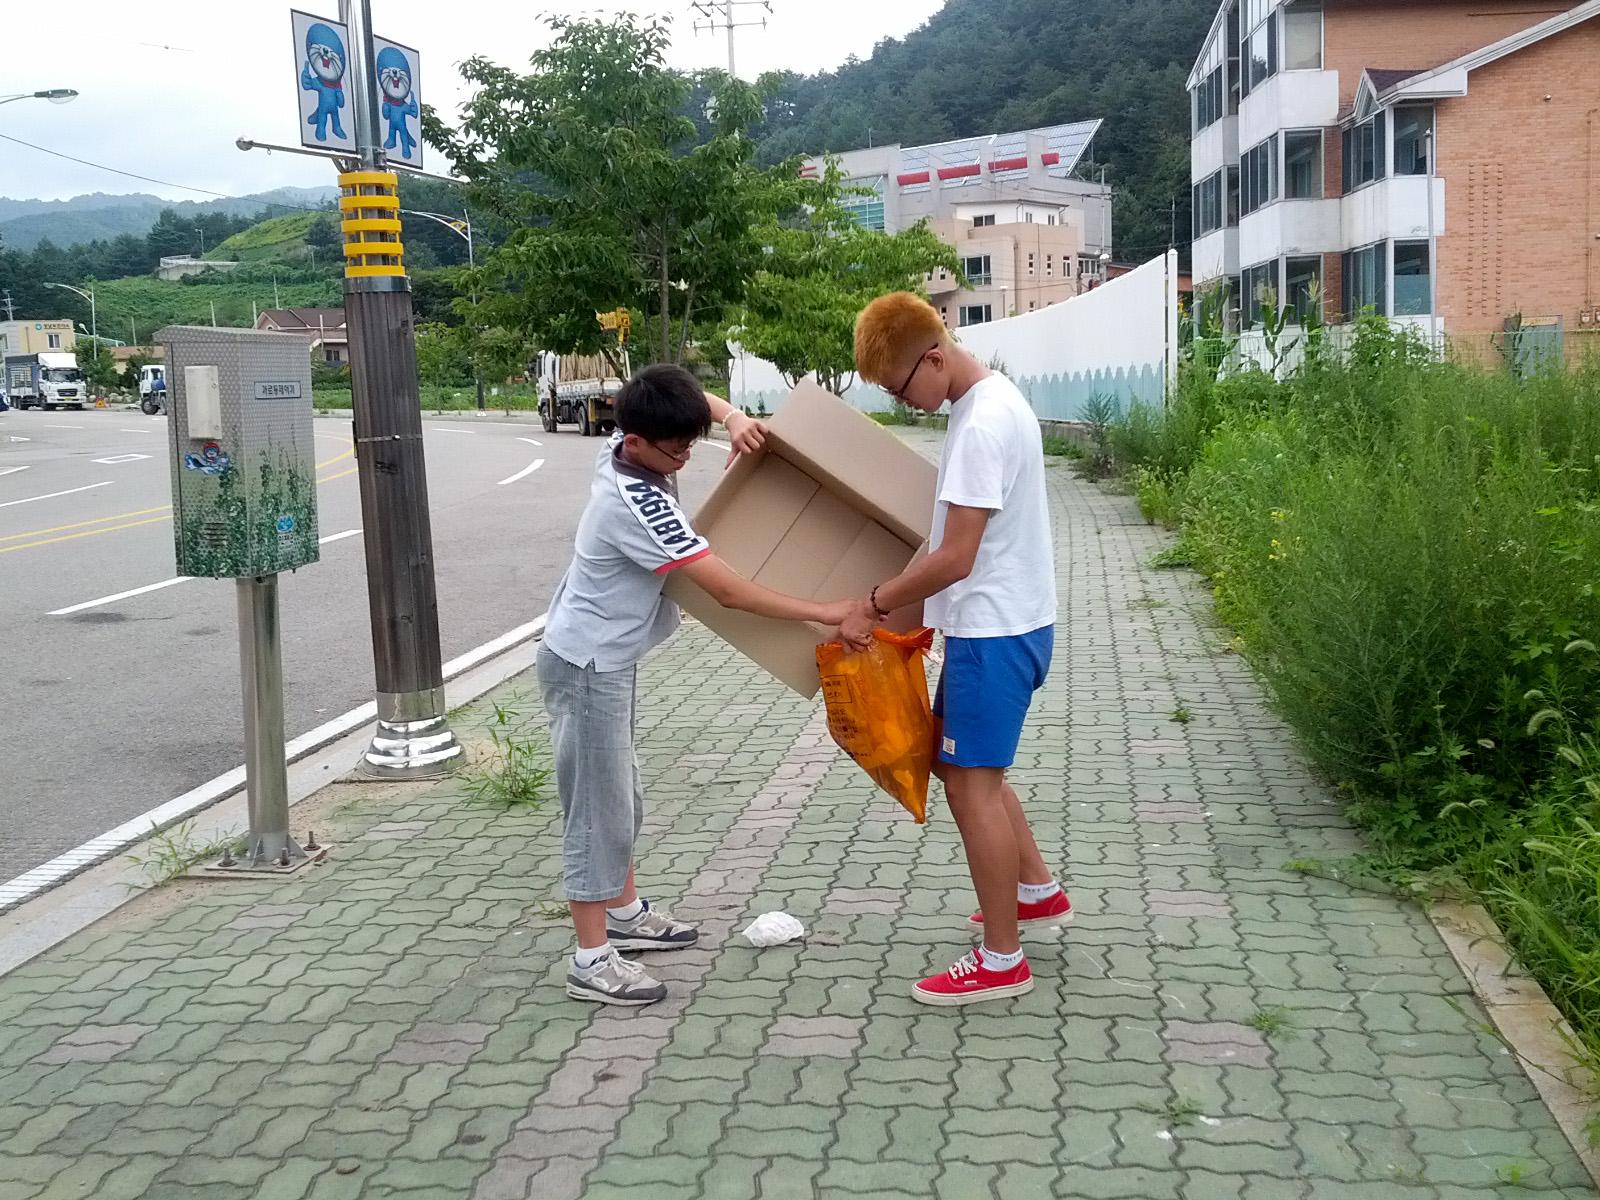 C360_2012-07-29-09-43-07.jpg